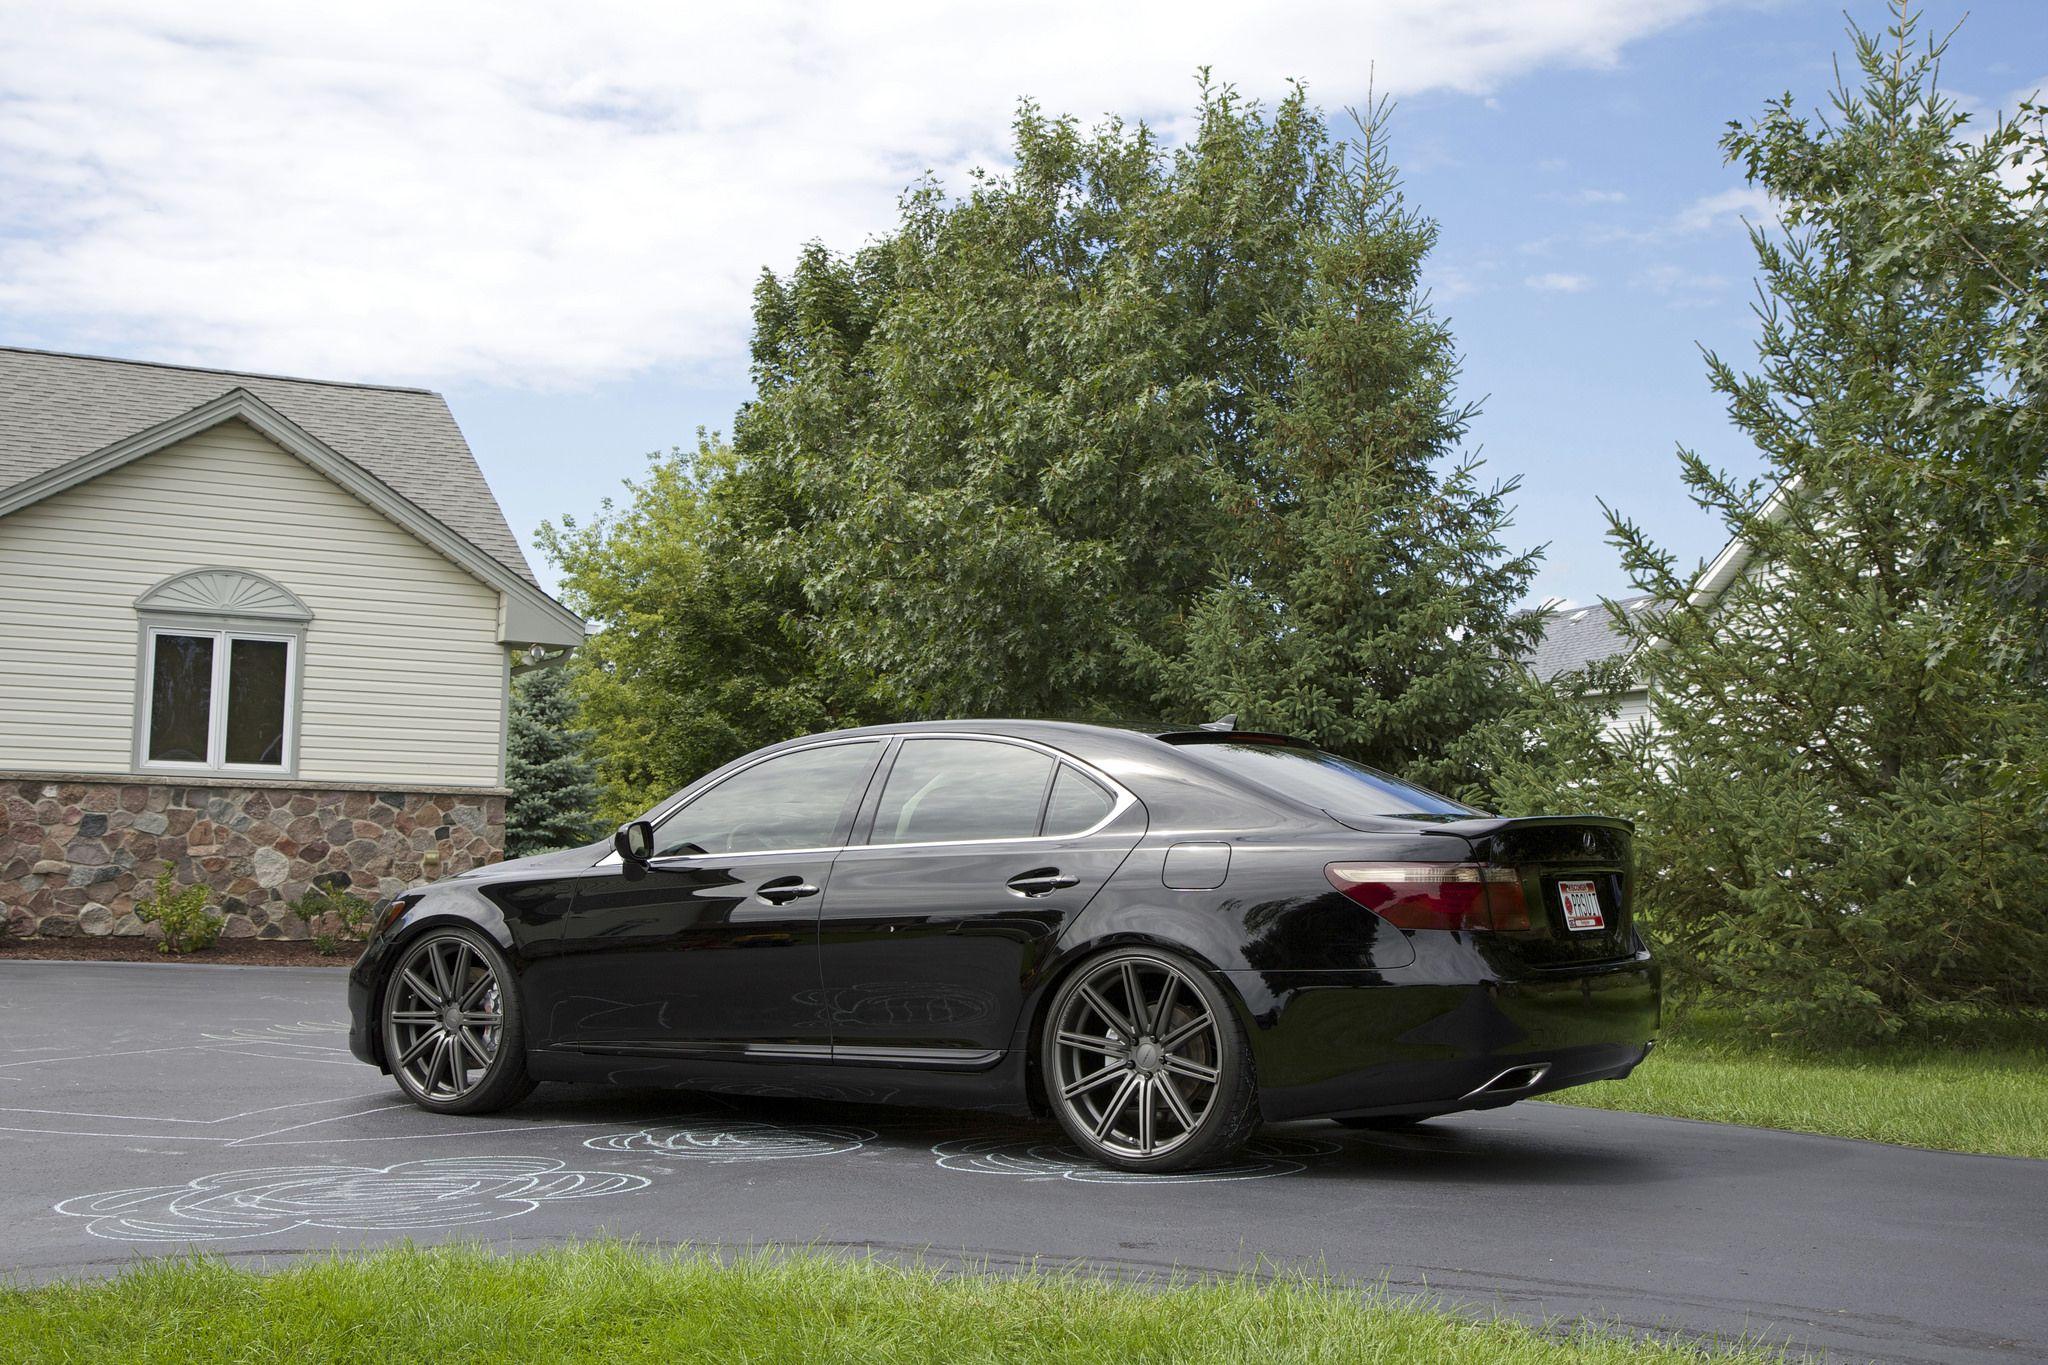 Lexus LS 460 looking mean on 22 inch alloy wheels